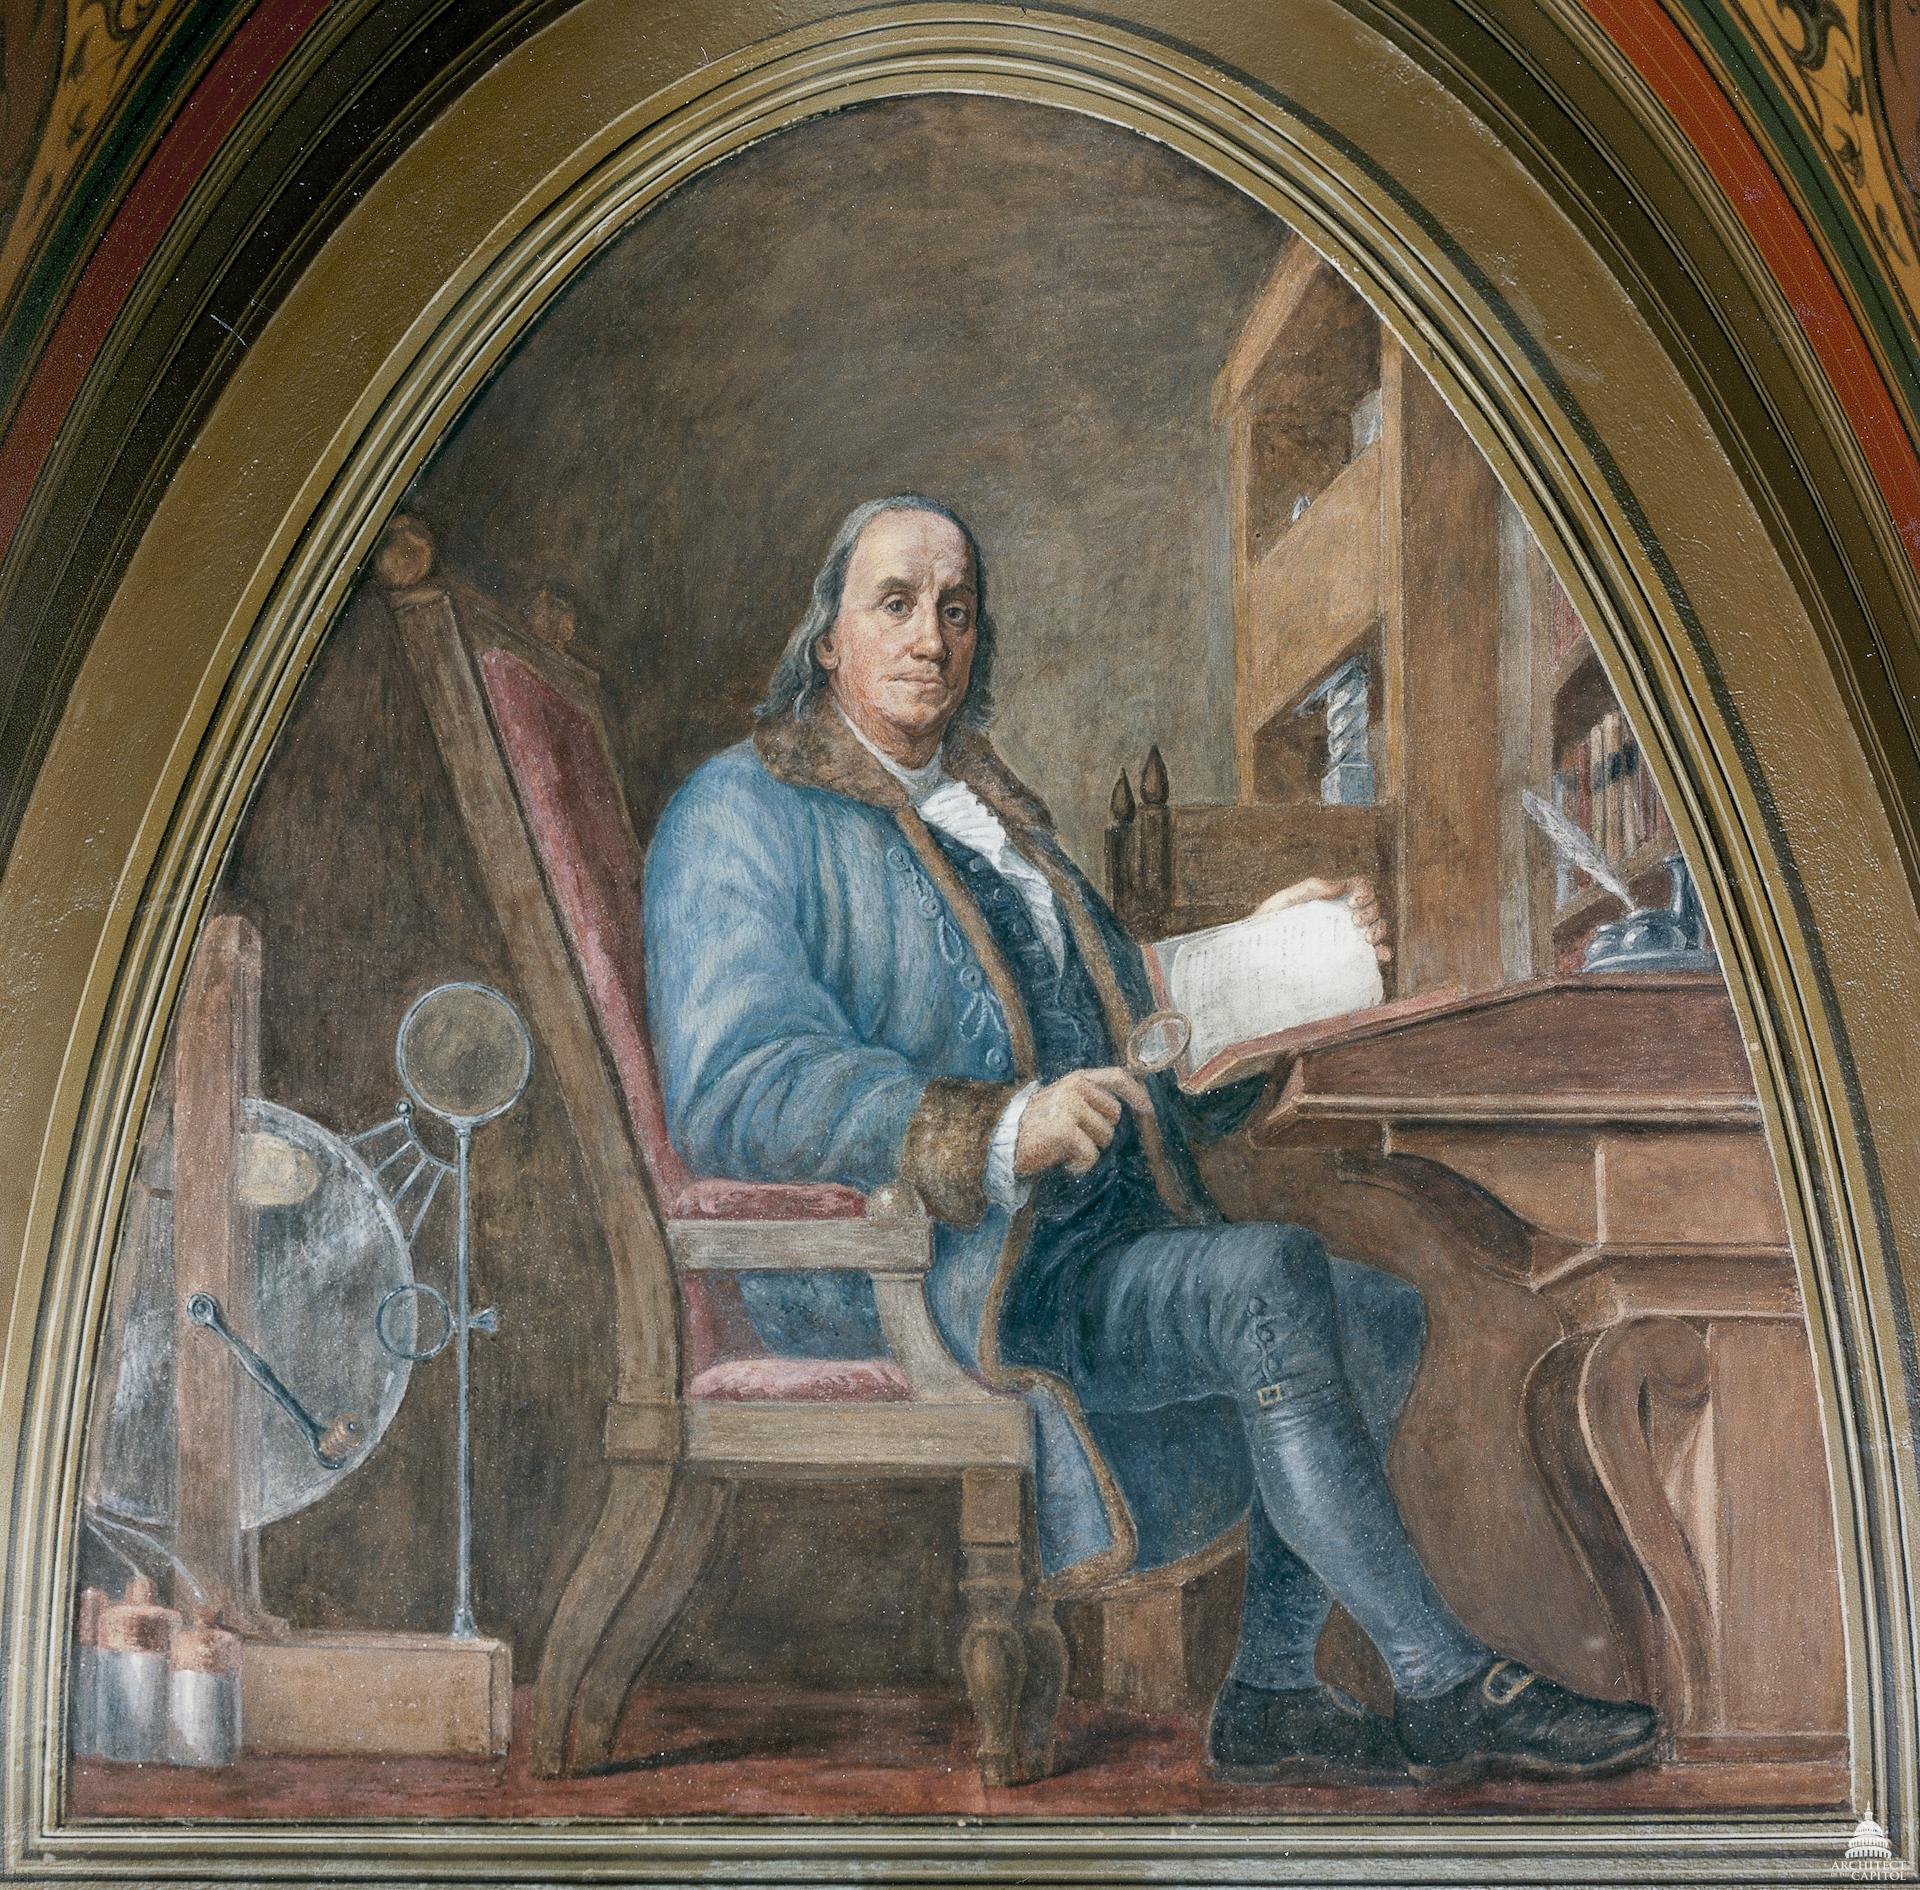 Benjamin Franklin, creator of the Join Or Die cartoon, via Wikimedia Commons.